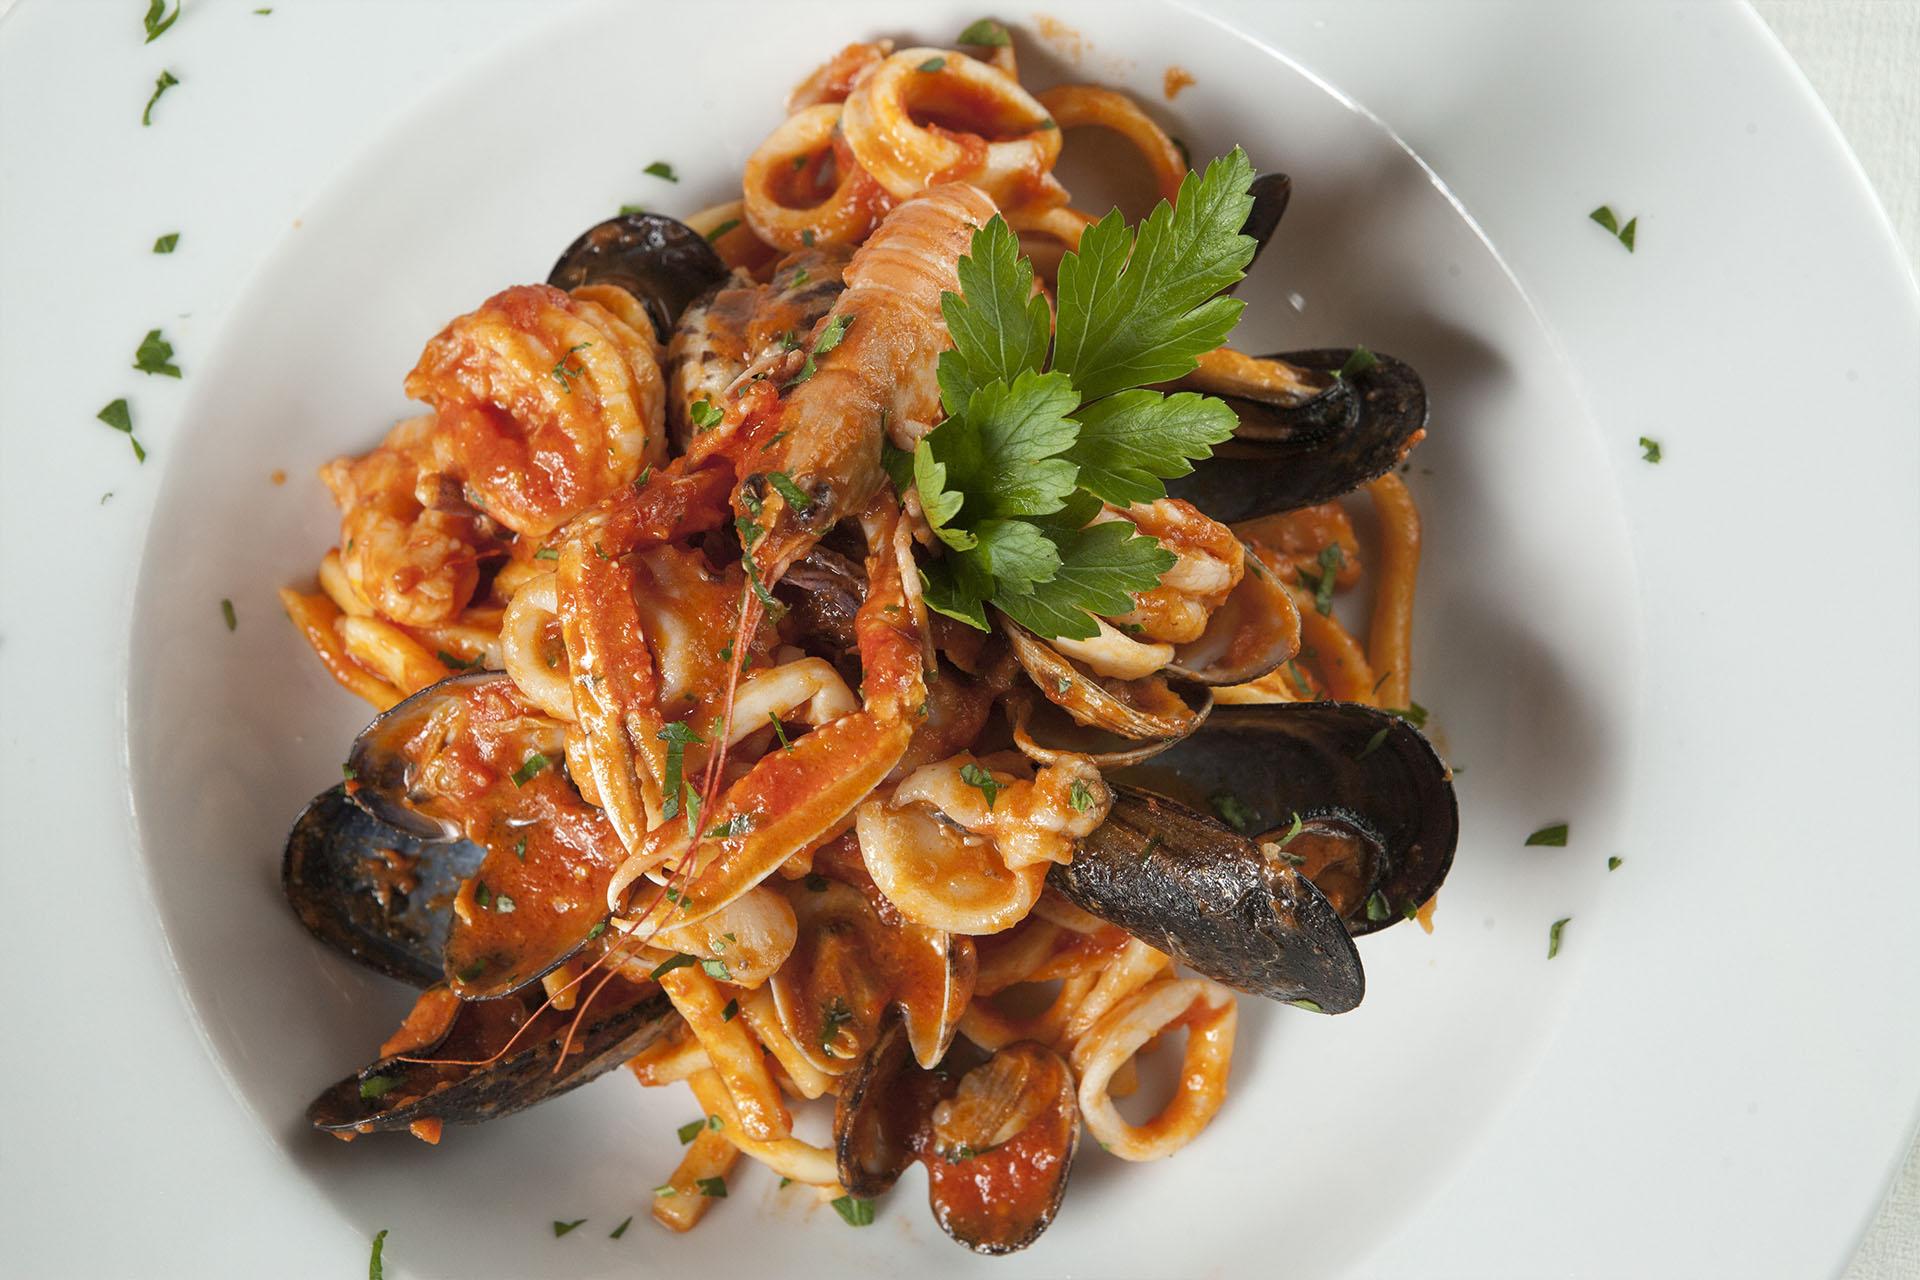 Taverna di Noè - Ristorante Lanzo Torinese